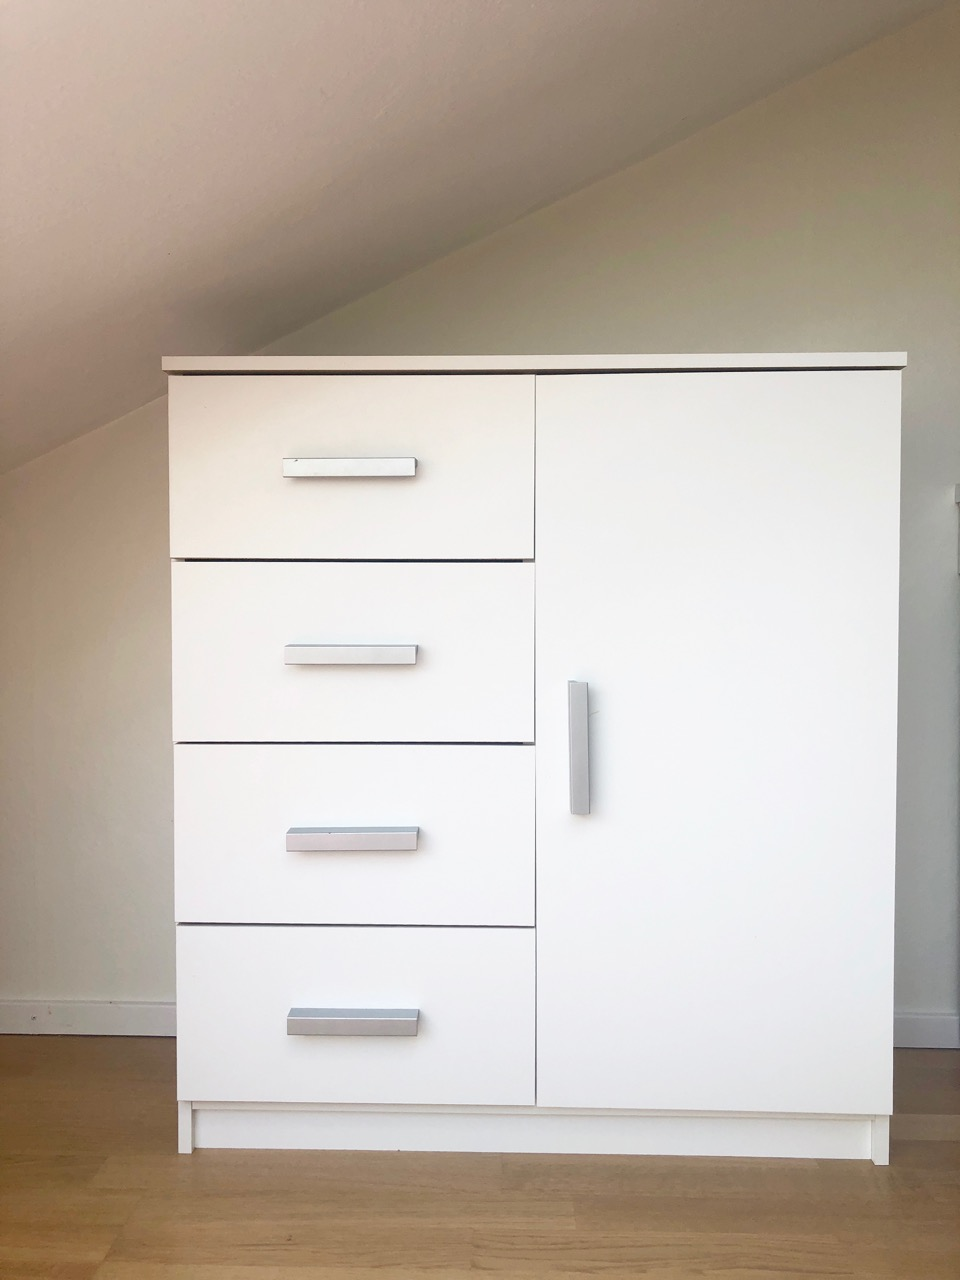 https://a-lehdet-blogs.s3.amazonaws.com/uploads/sites/69/2018/08/ostolakossa-minimalismi